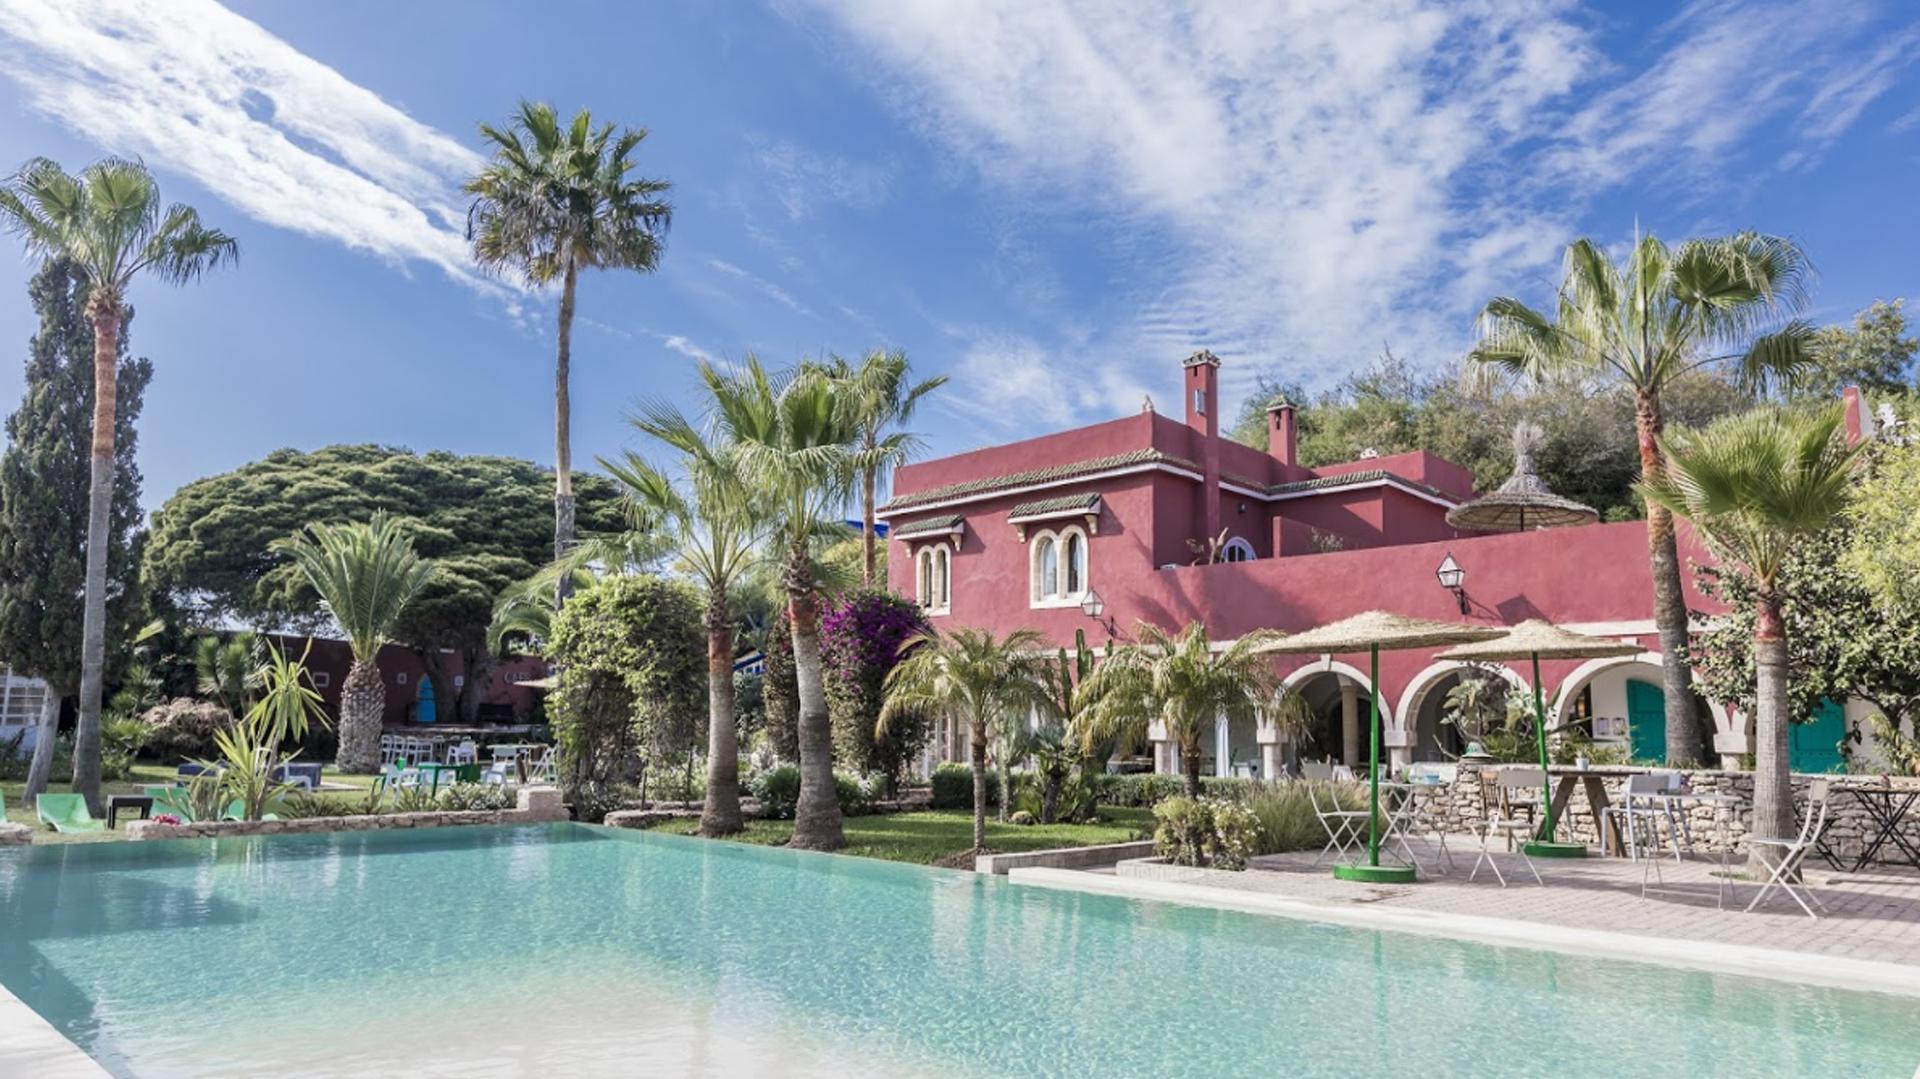 Hotel piscine Essaouira